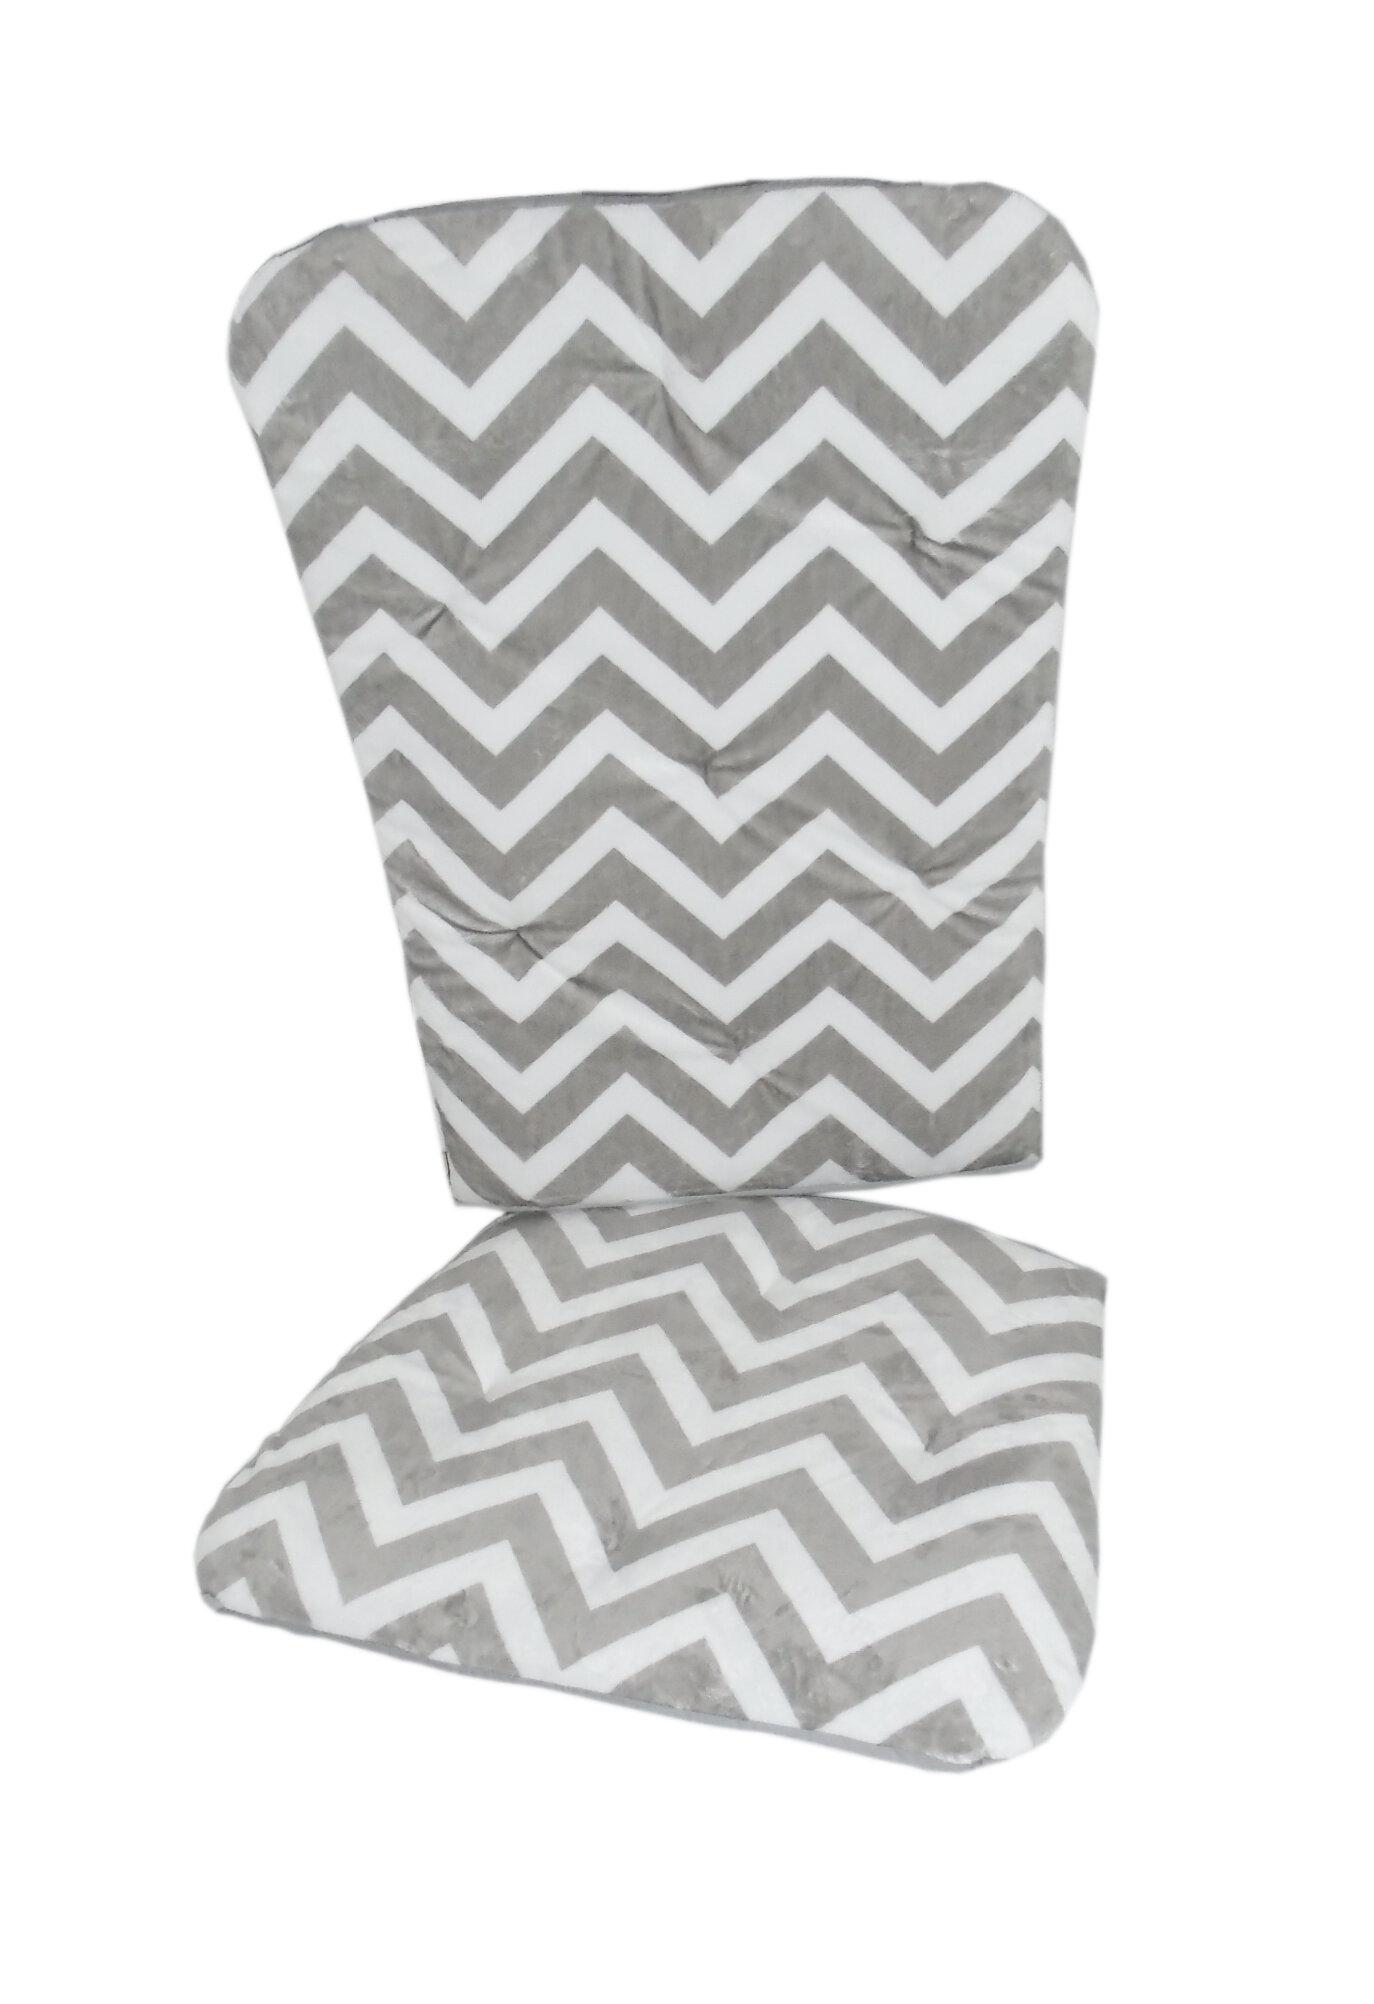 Delicieux BabyDoll Bedding Minky Chevron Rocking Chair Cushion   Wayfair